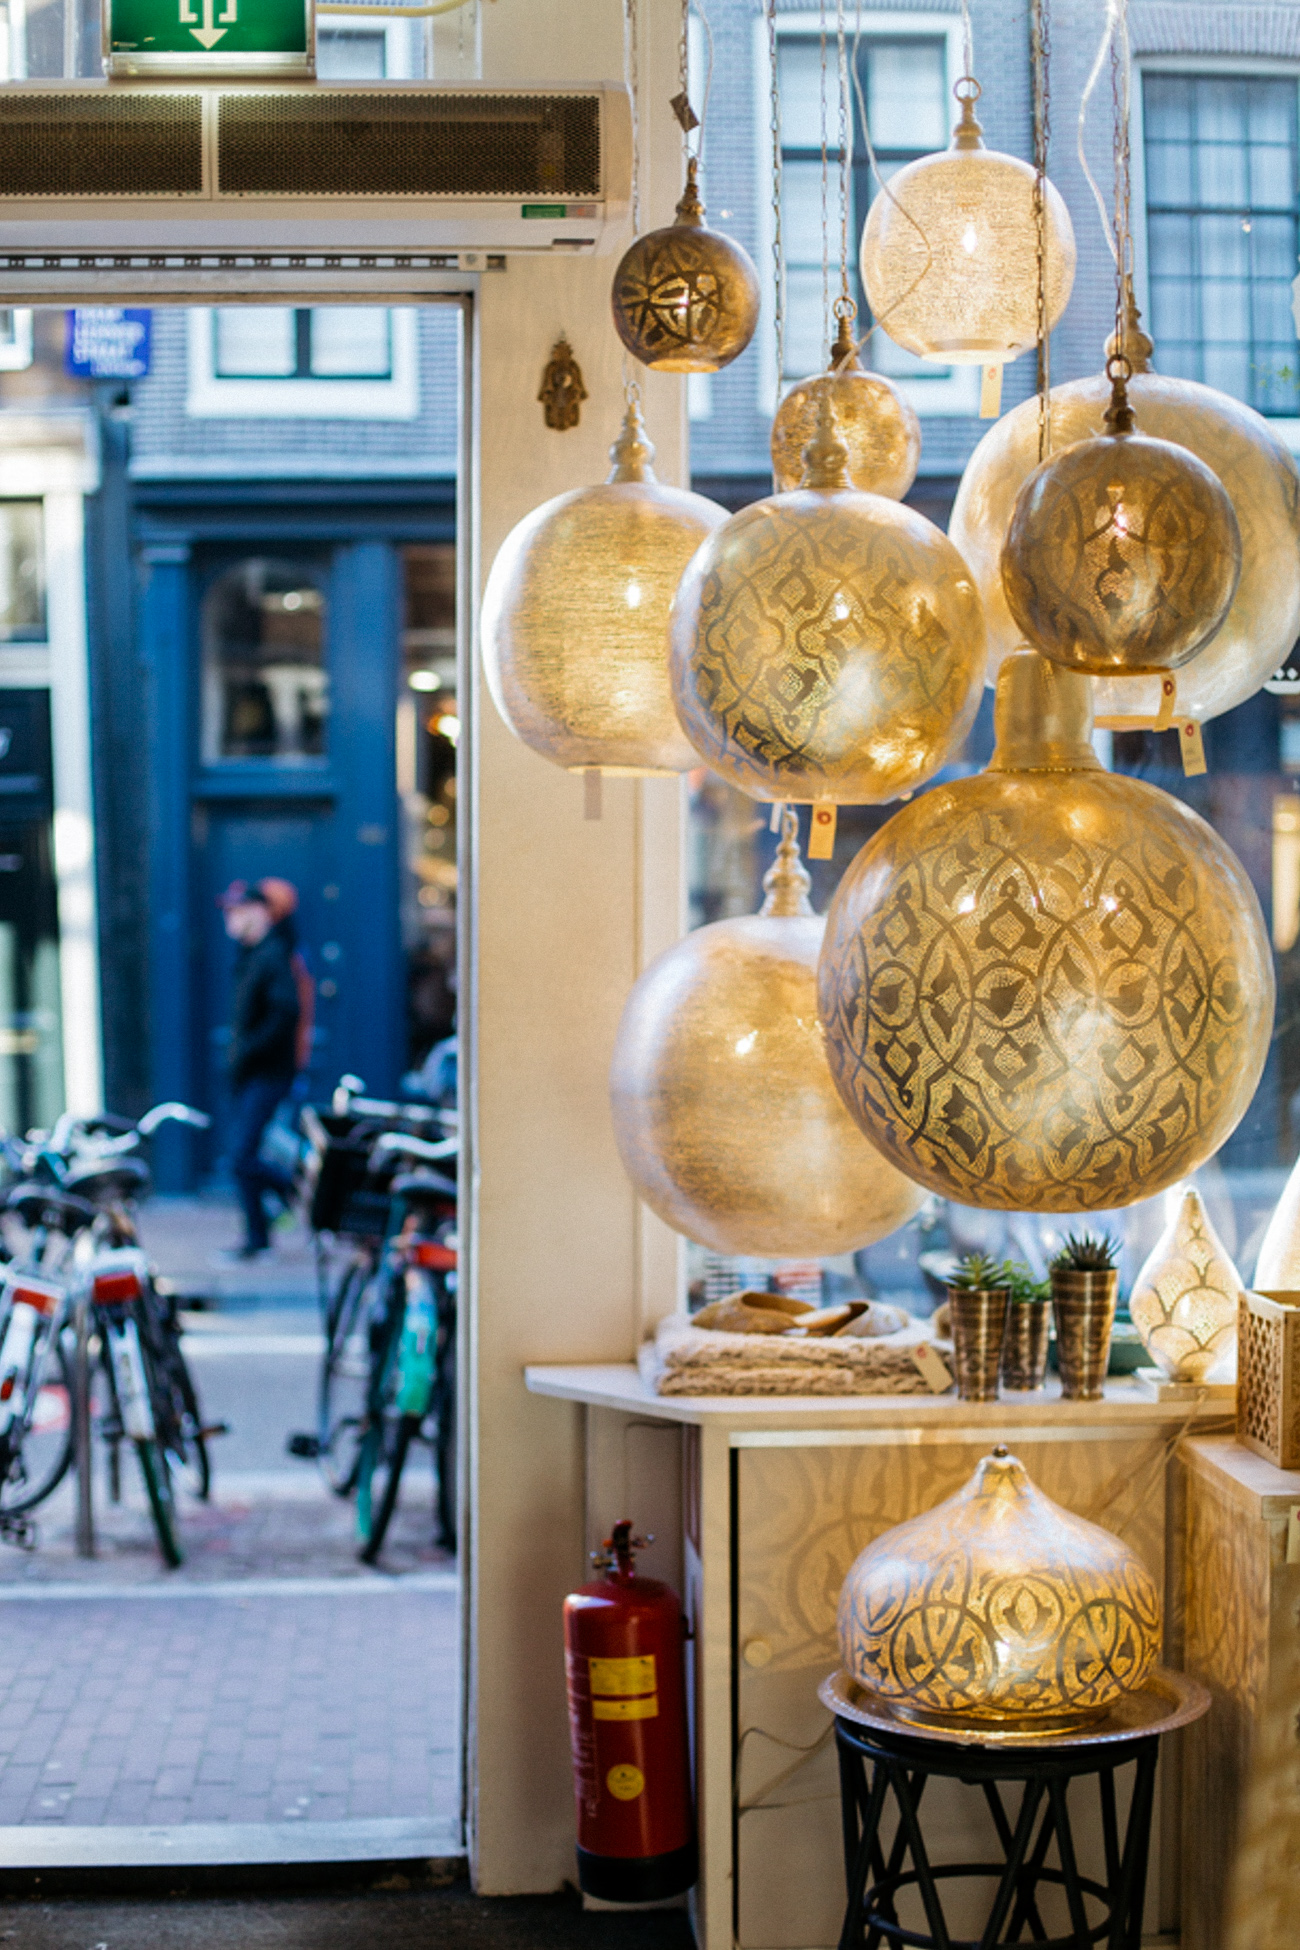 Heather Bullard | Amsterdam Shopping